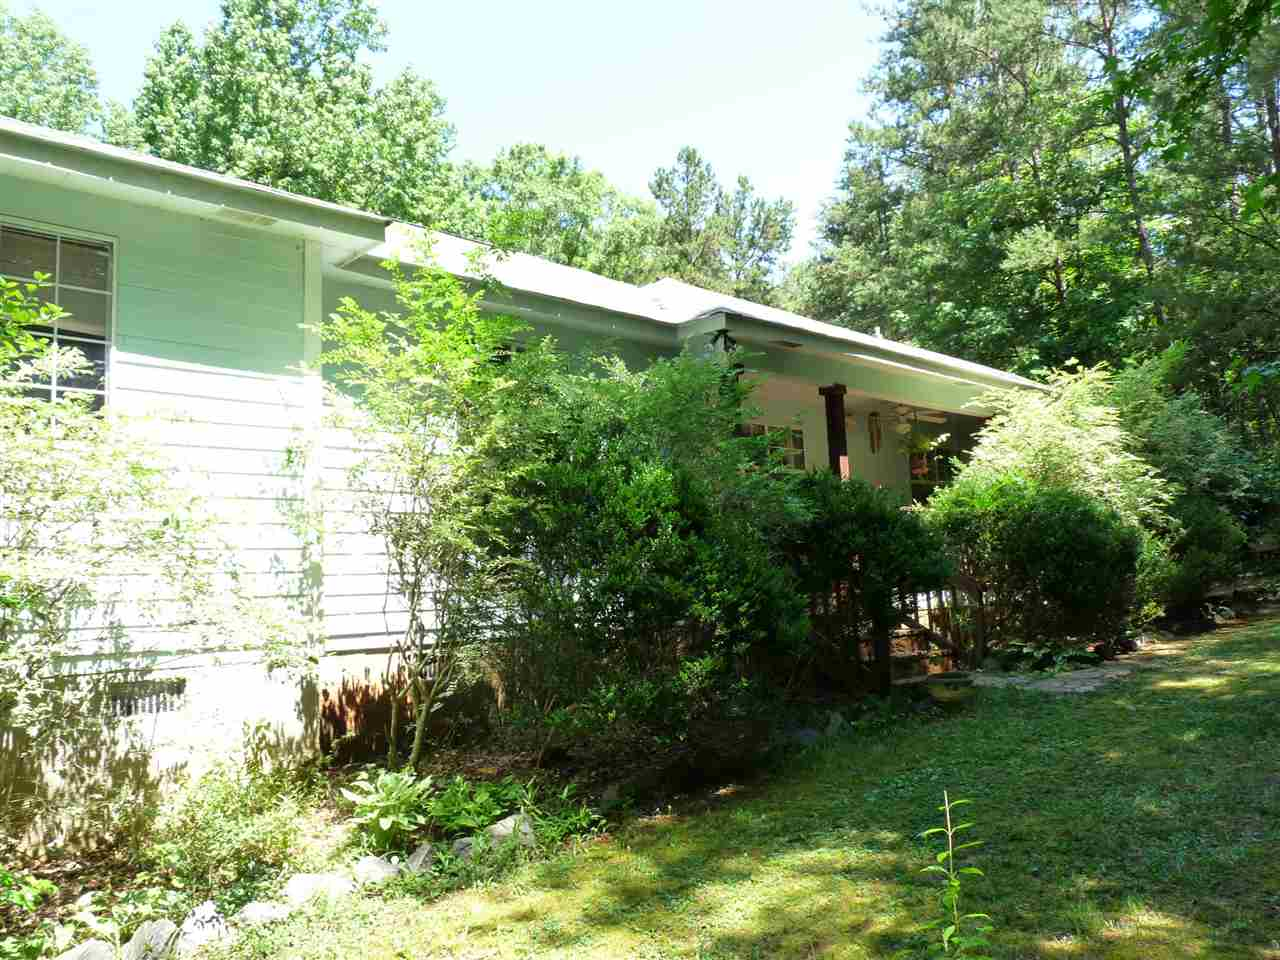 Real Estate for Sale, ListingId: 35685334, Waxhaw,NC28173